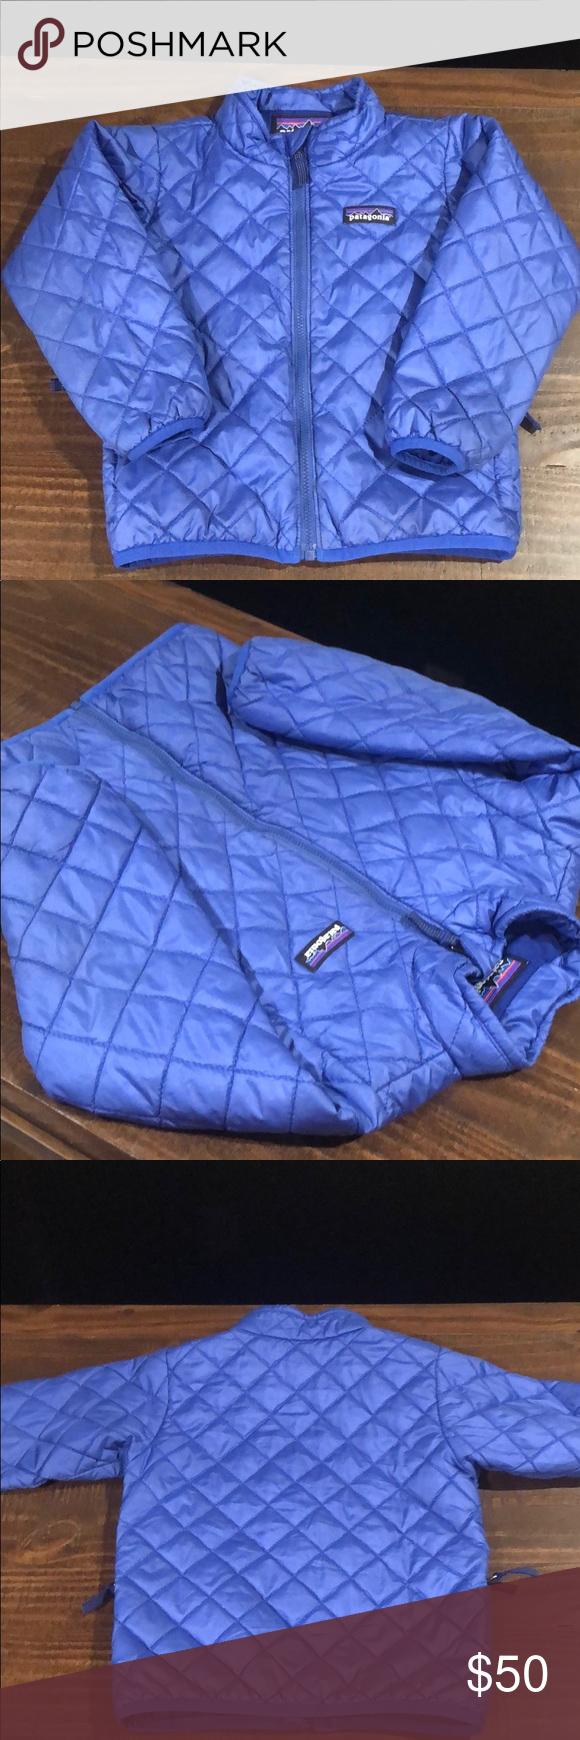 Patagonia toddler puffer coat size 3t royal blue Puffer